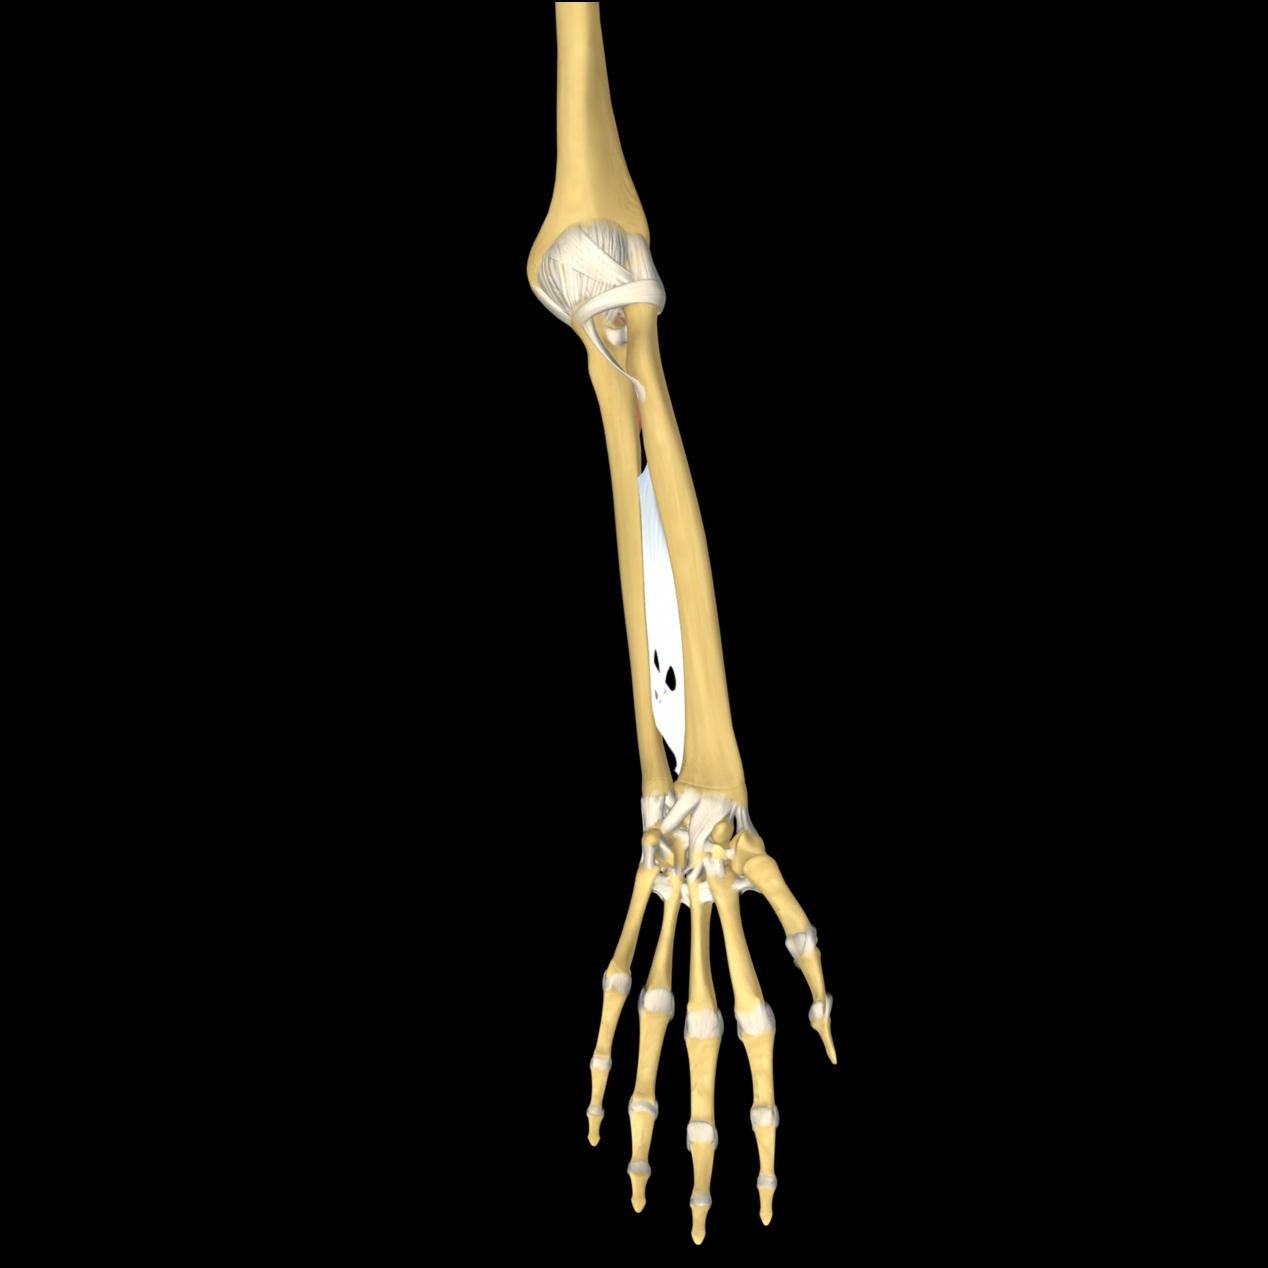 anatomyEXPERT - Flexor...